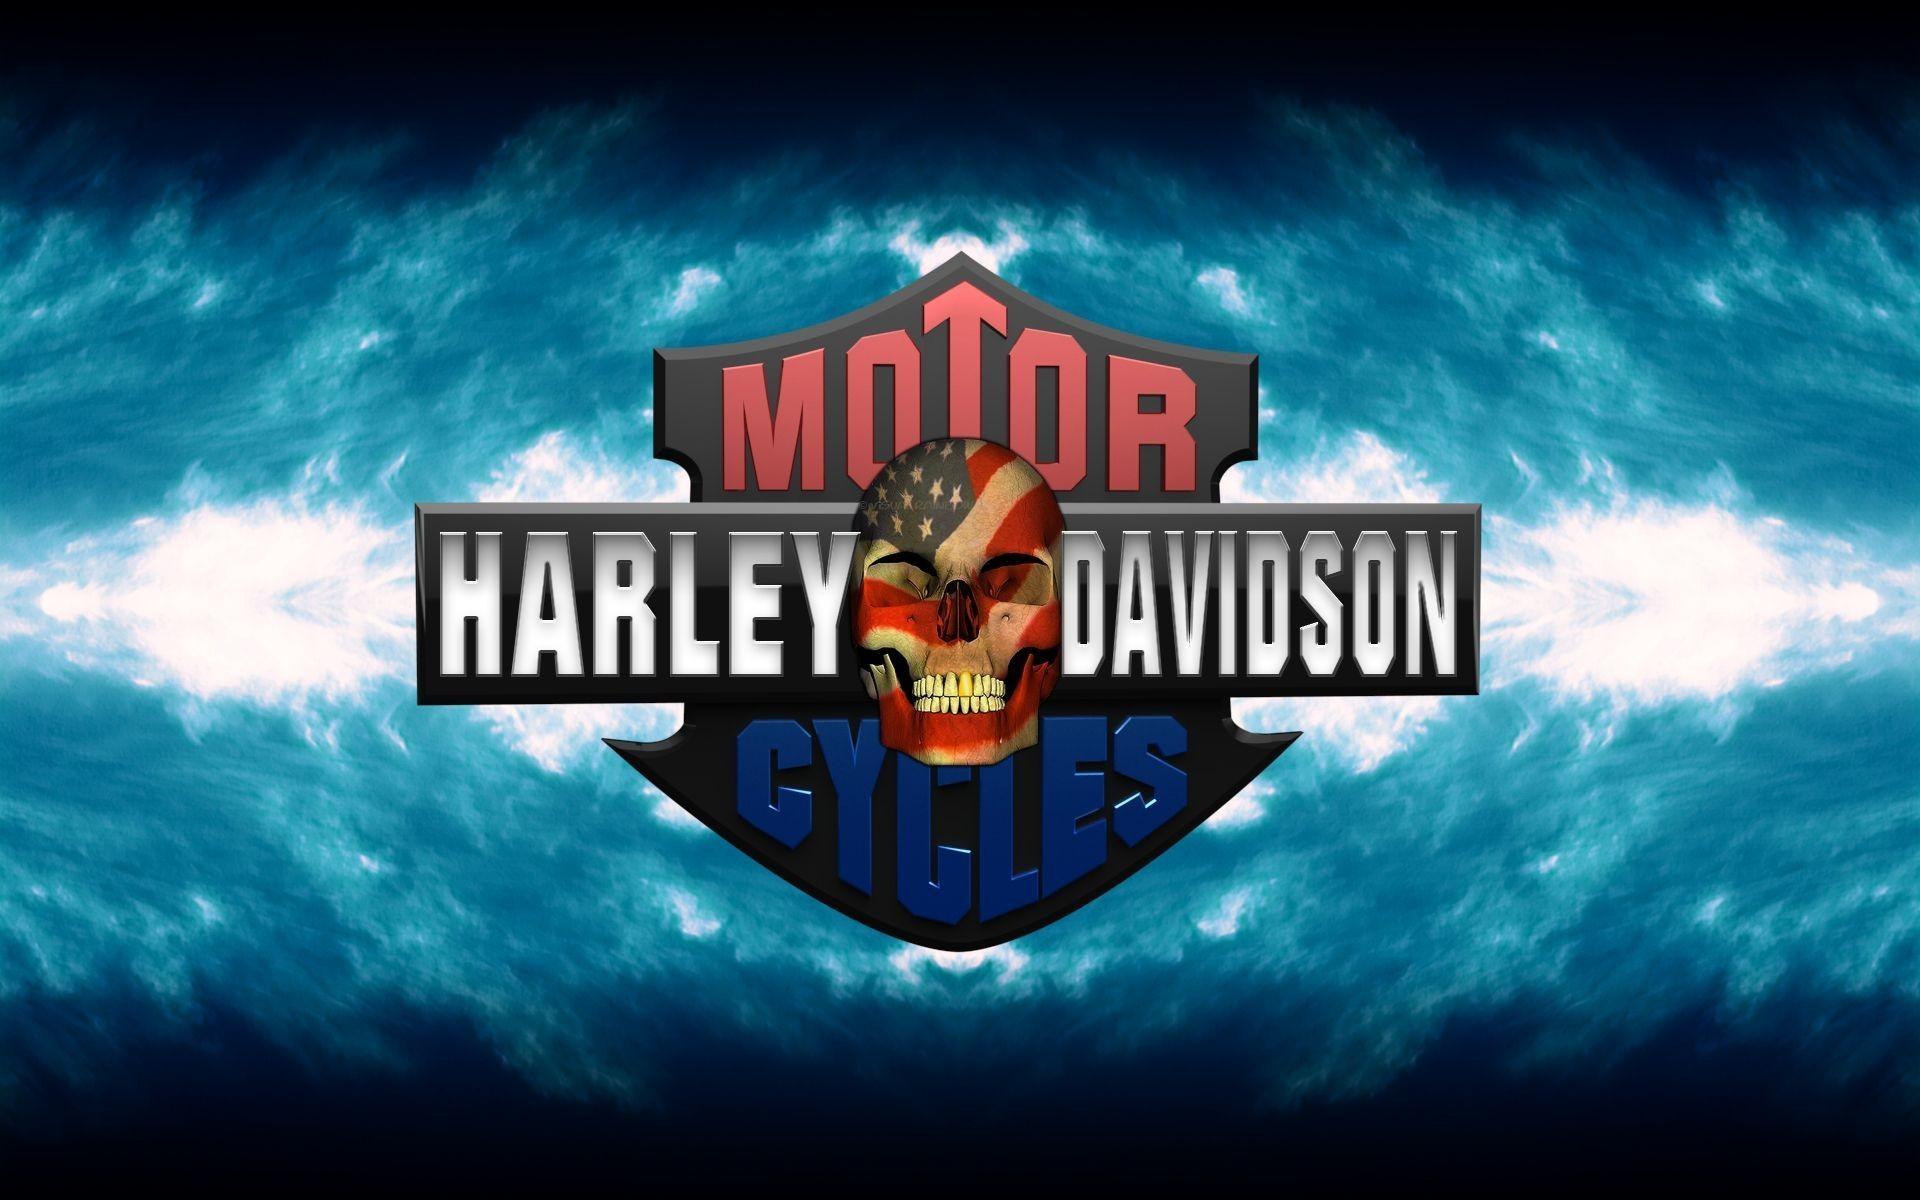 Harley Davidson Logo Wallpaper ·① WallpaperTag